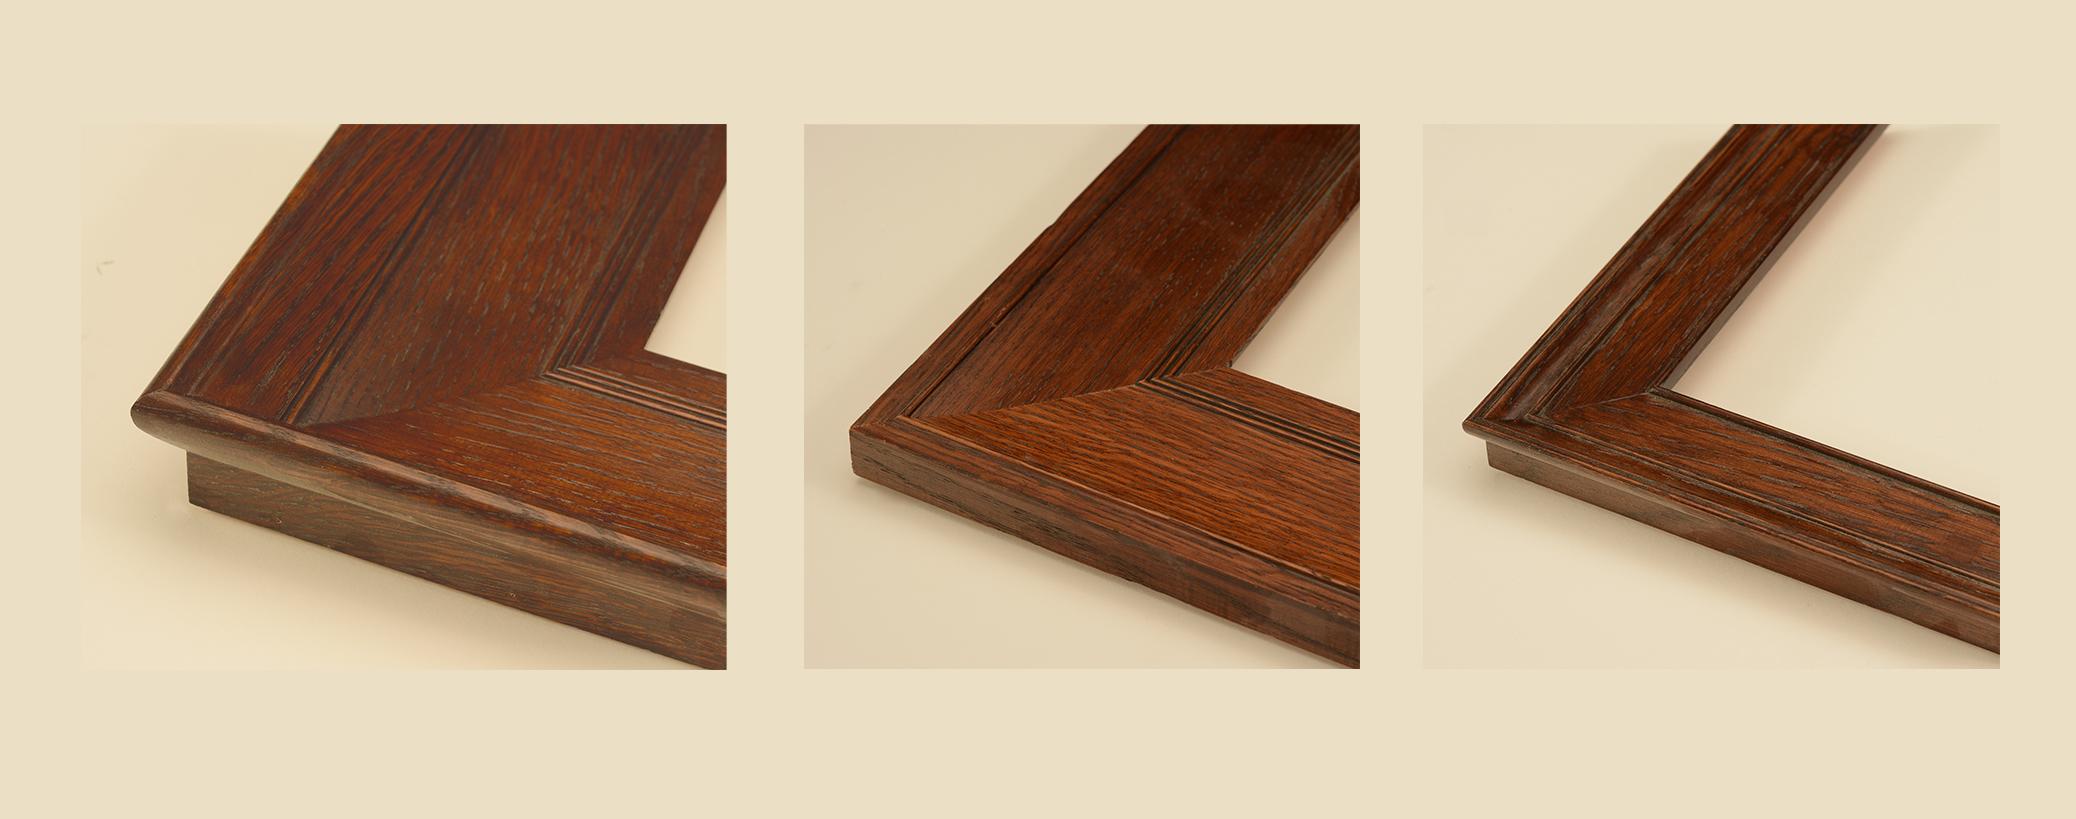 Edward Curtis Frames - custom picture frame manufacturing